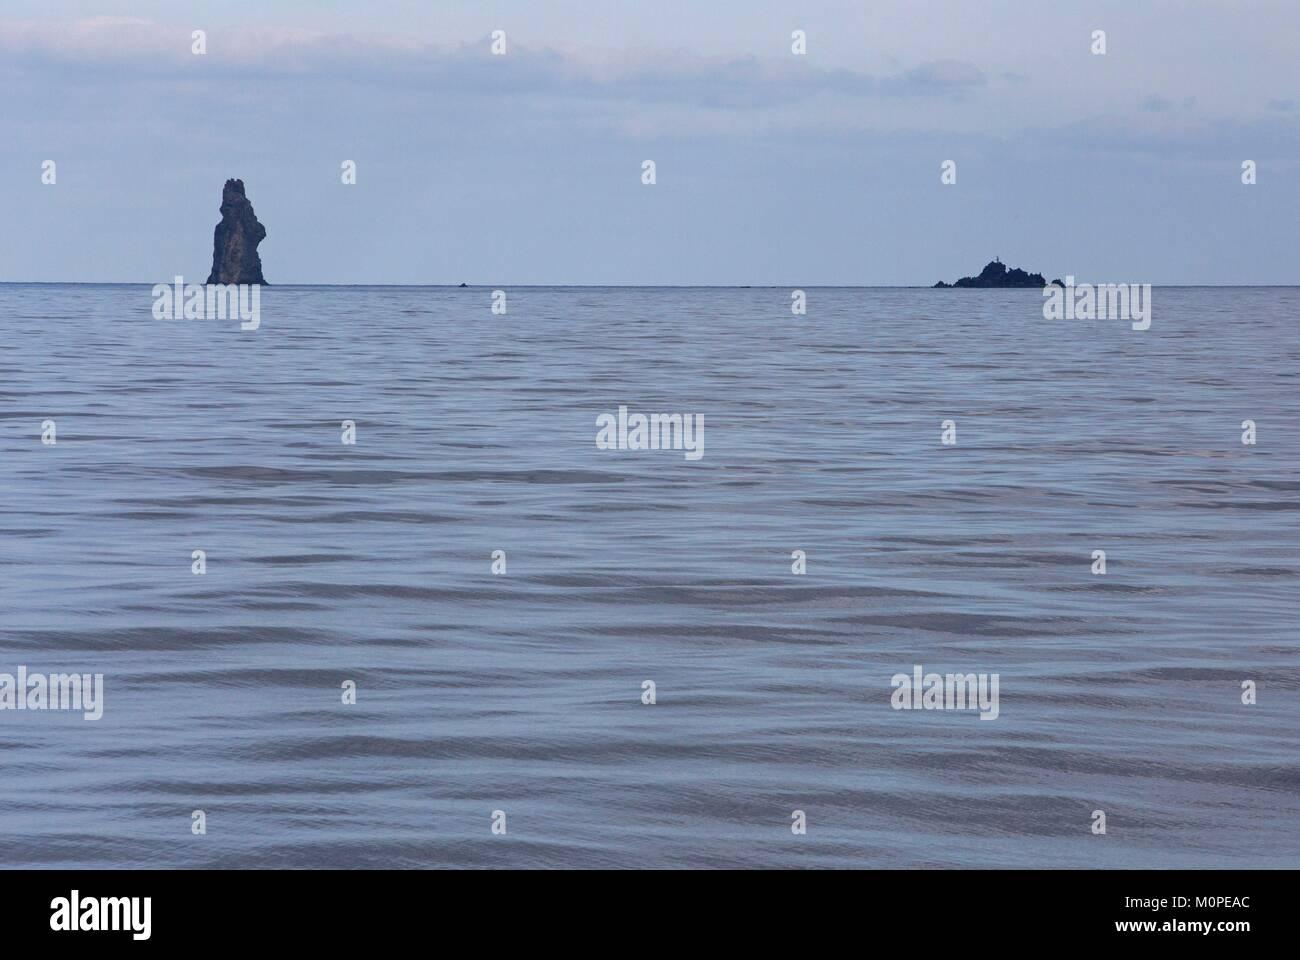 Italy,Sicily,Aeolian Islands,Filicudi Island,the walking stick Stock Photo